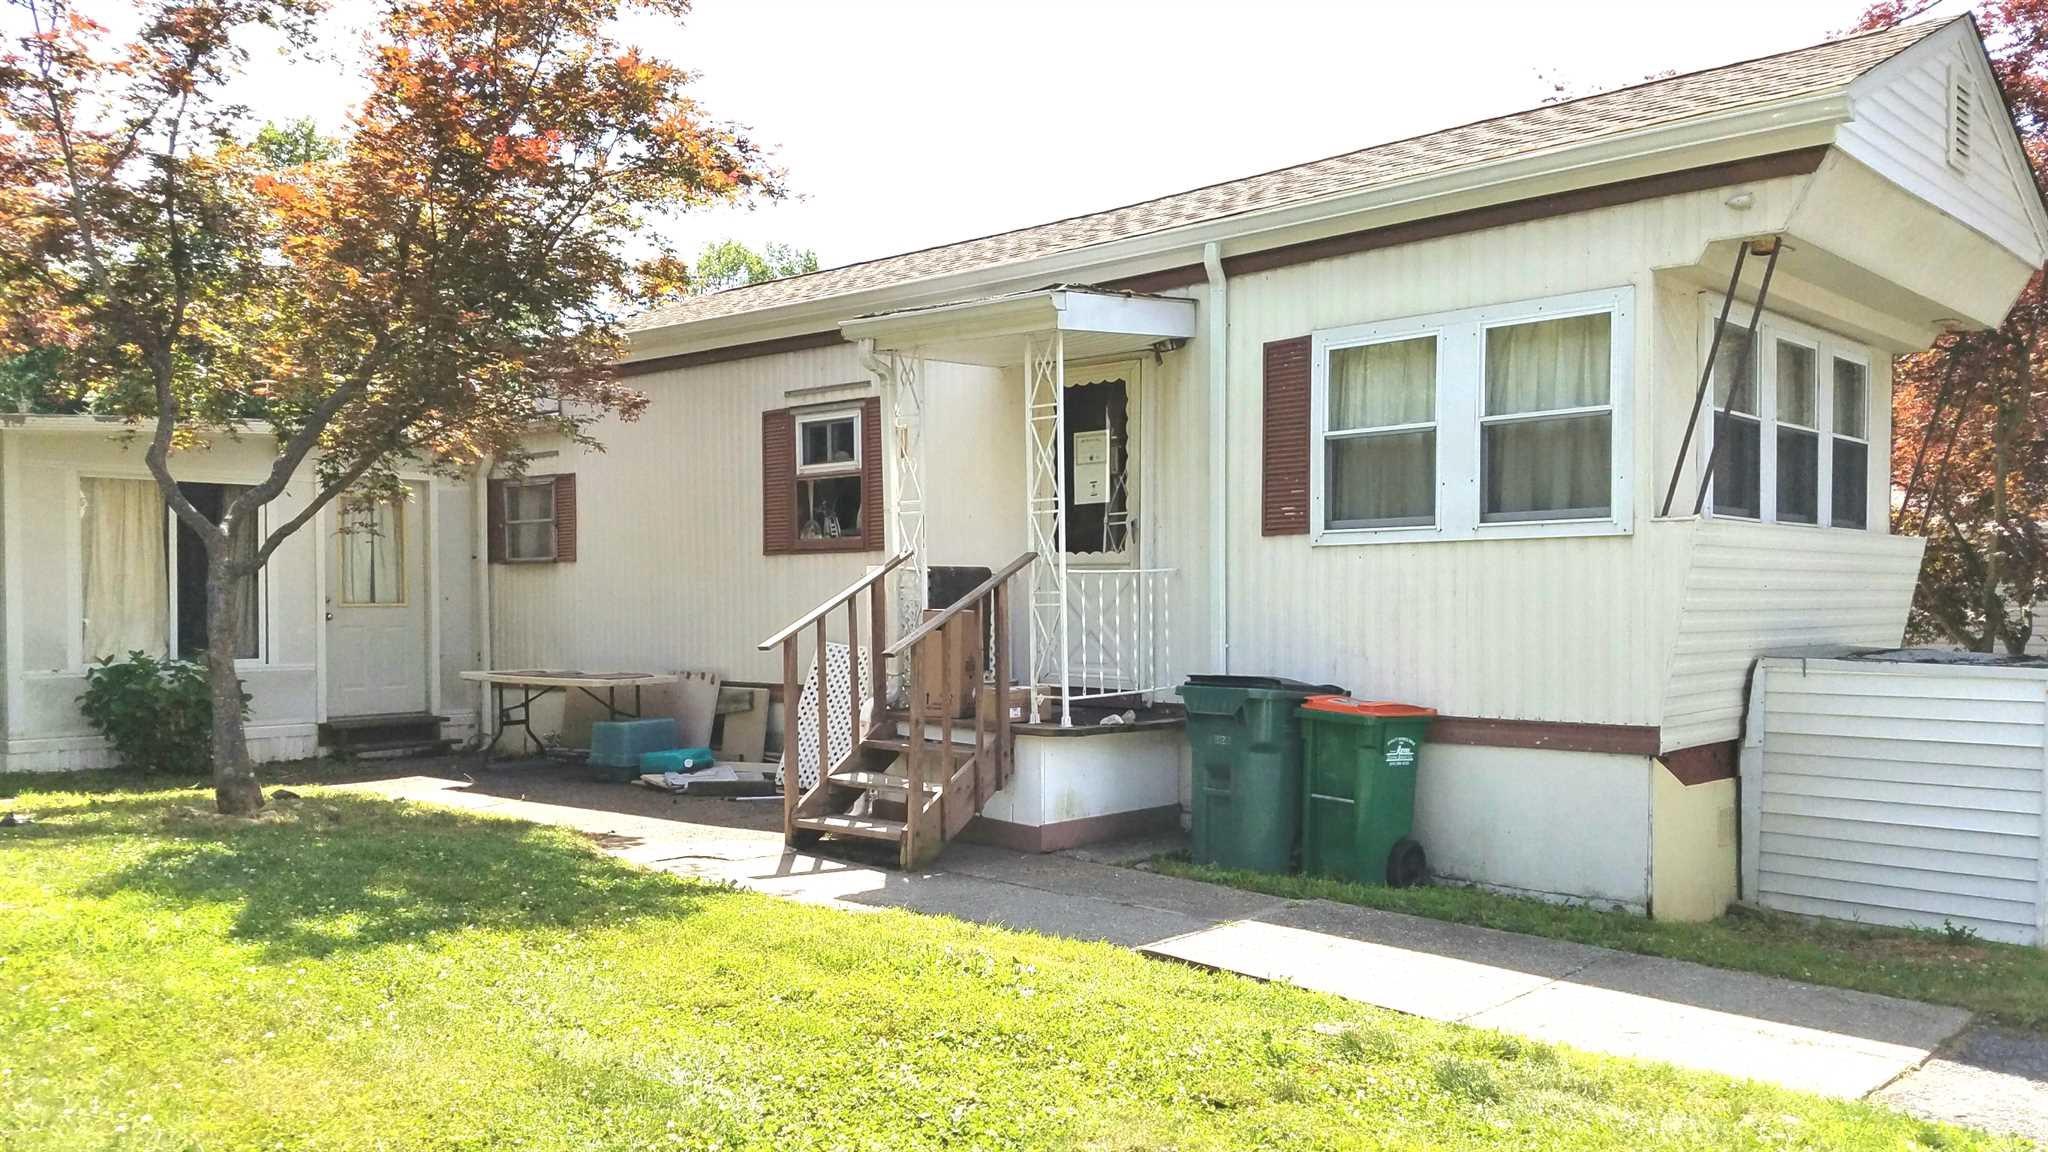 Single Family Home for Sale at 20 TREELINE CIRCLE 20 TREELINE CIRCLE Philipstown, New York 10516 United States